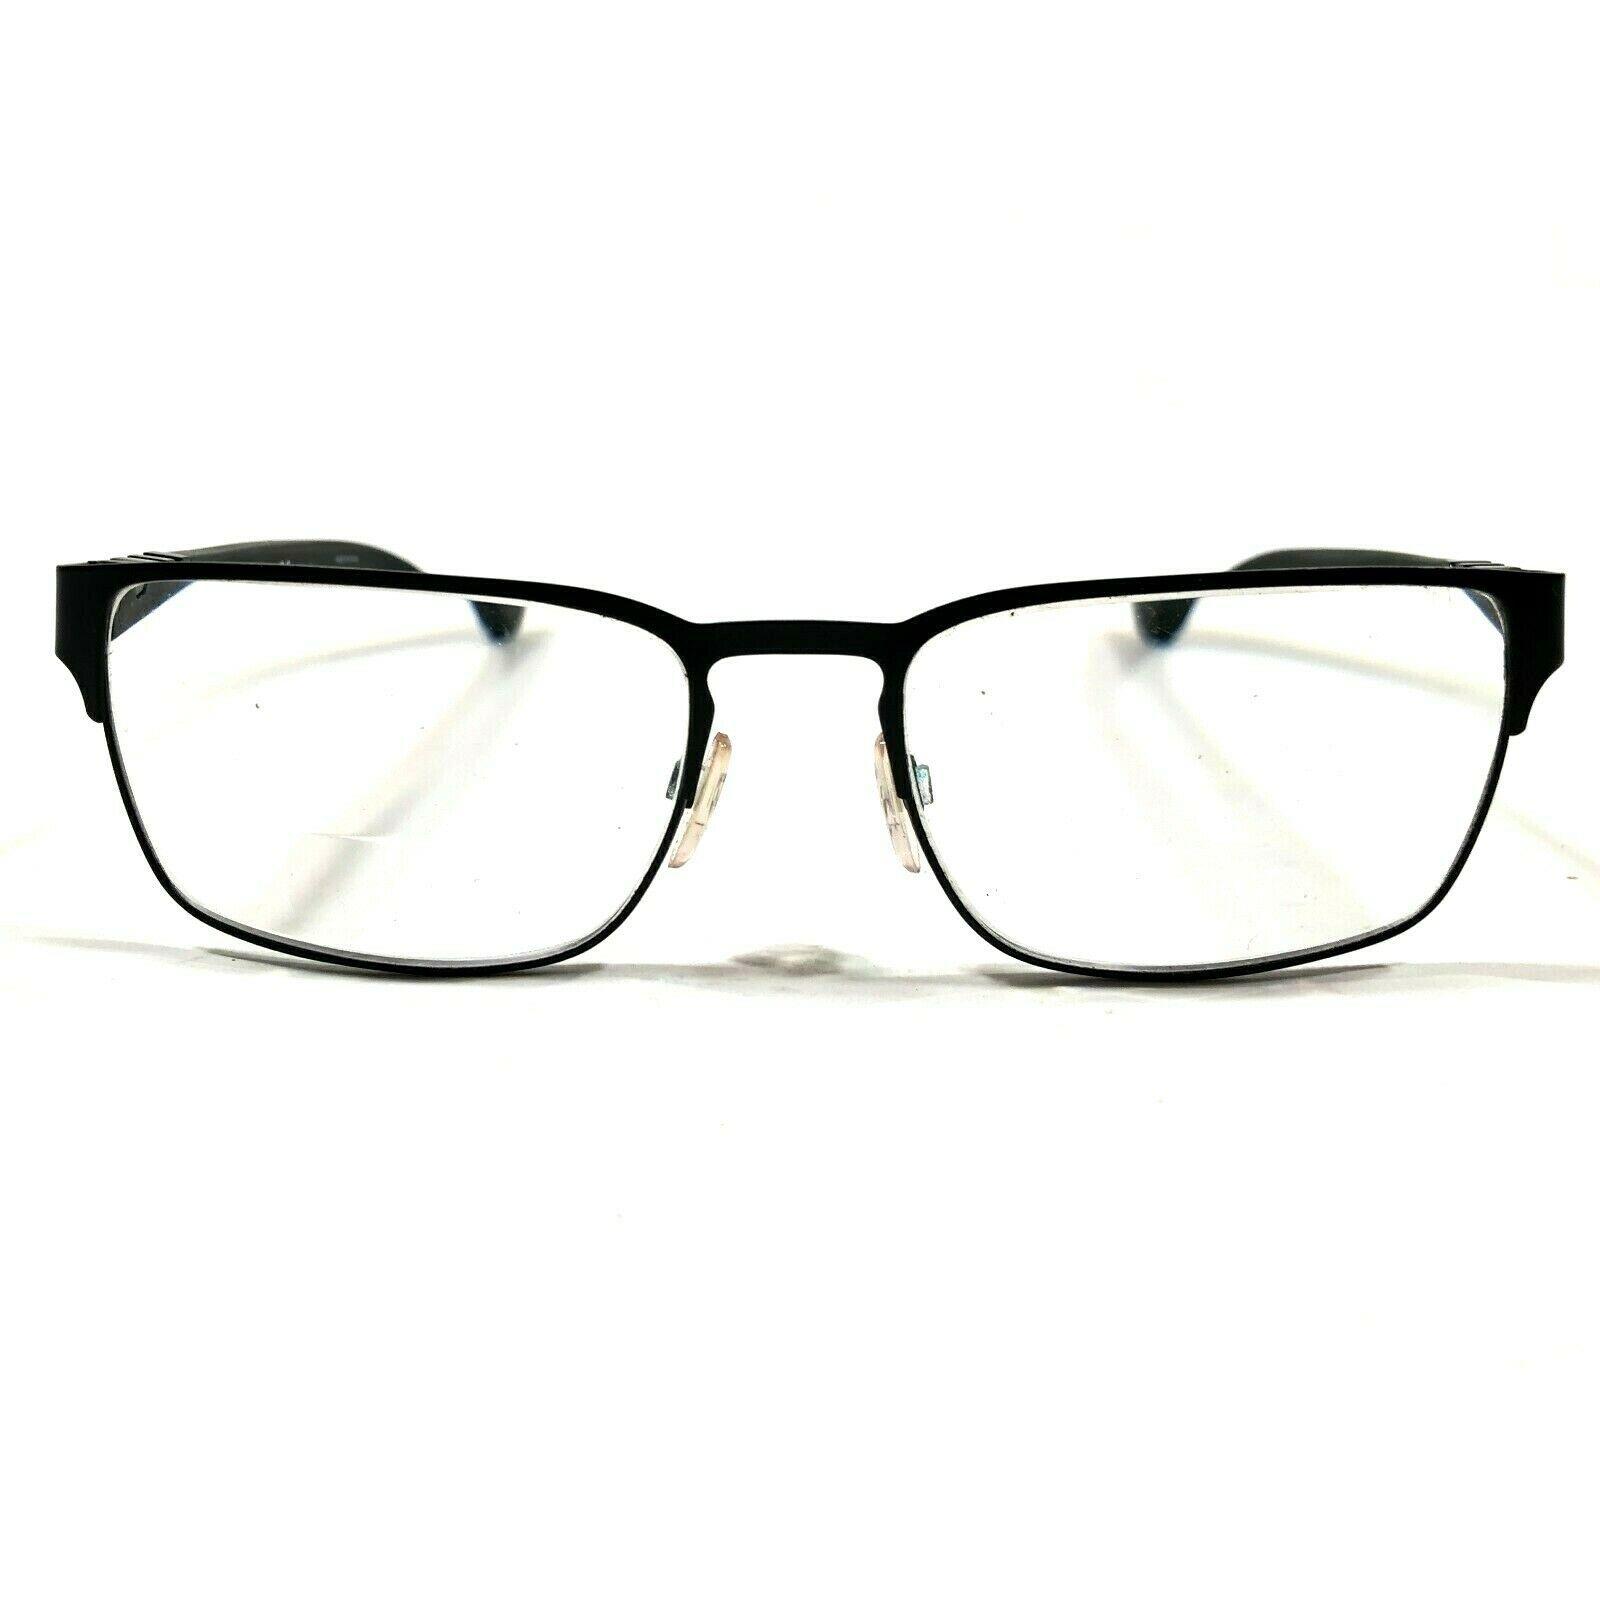 Emporio Armani Matte Black Thin Rimmed Square Eyeglasses Frames EA1027 3001 140 - $60.78